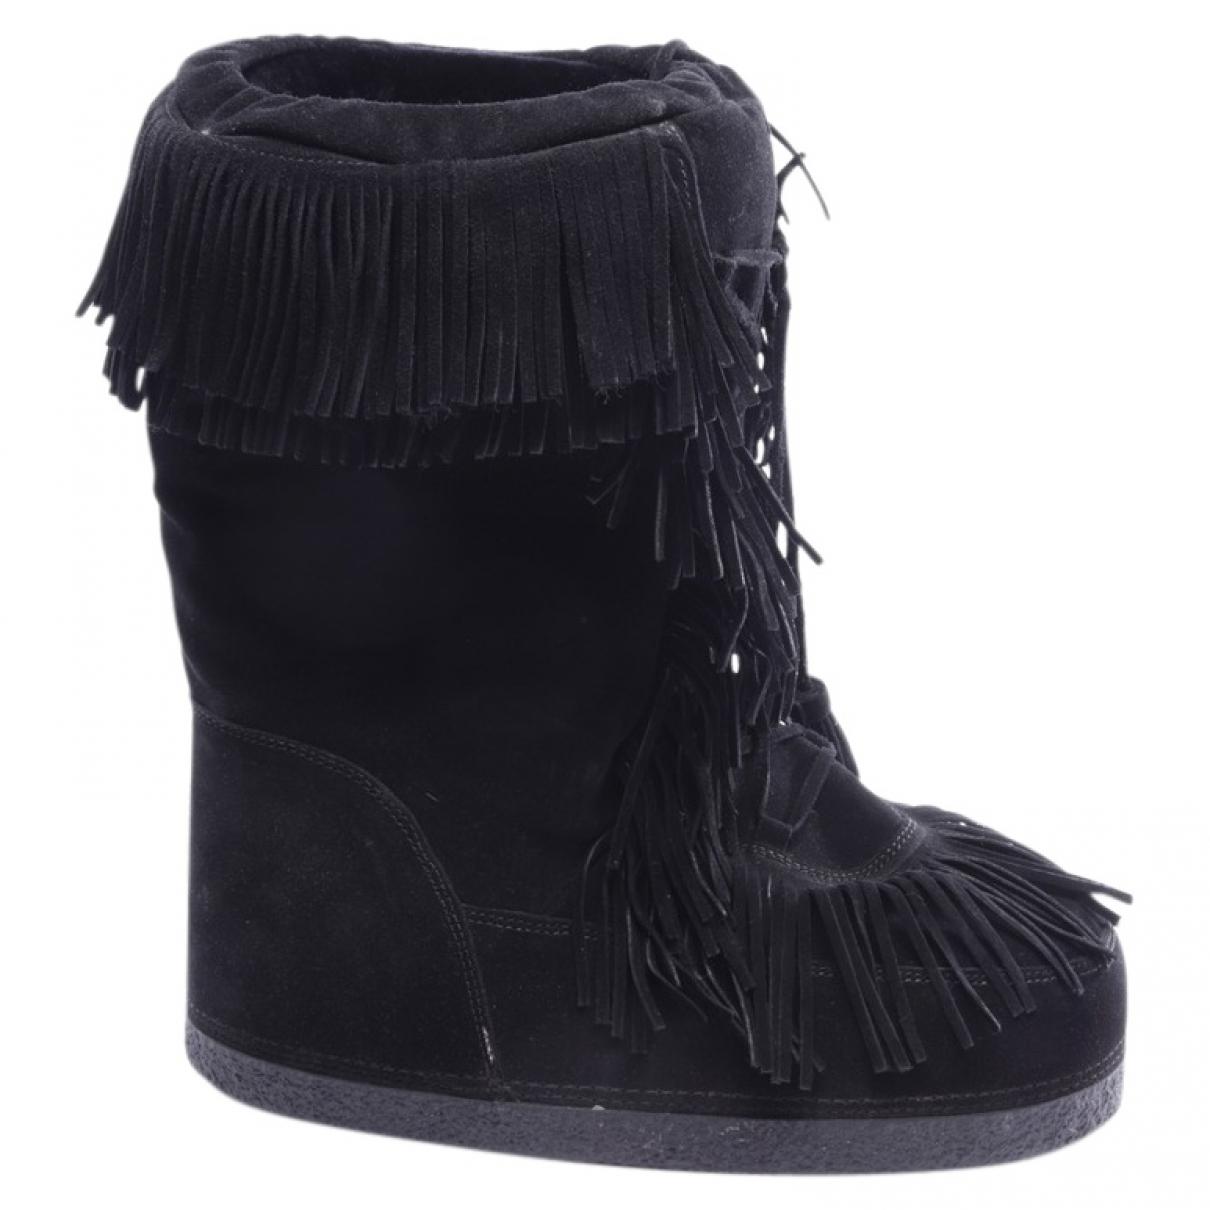 Aquazzura \N Black Leather Boots for Women 41 EU